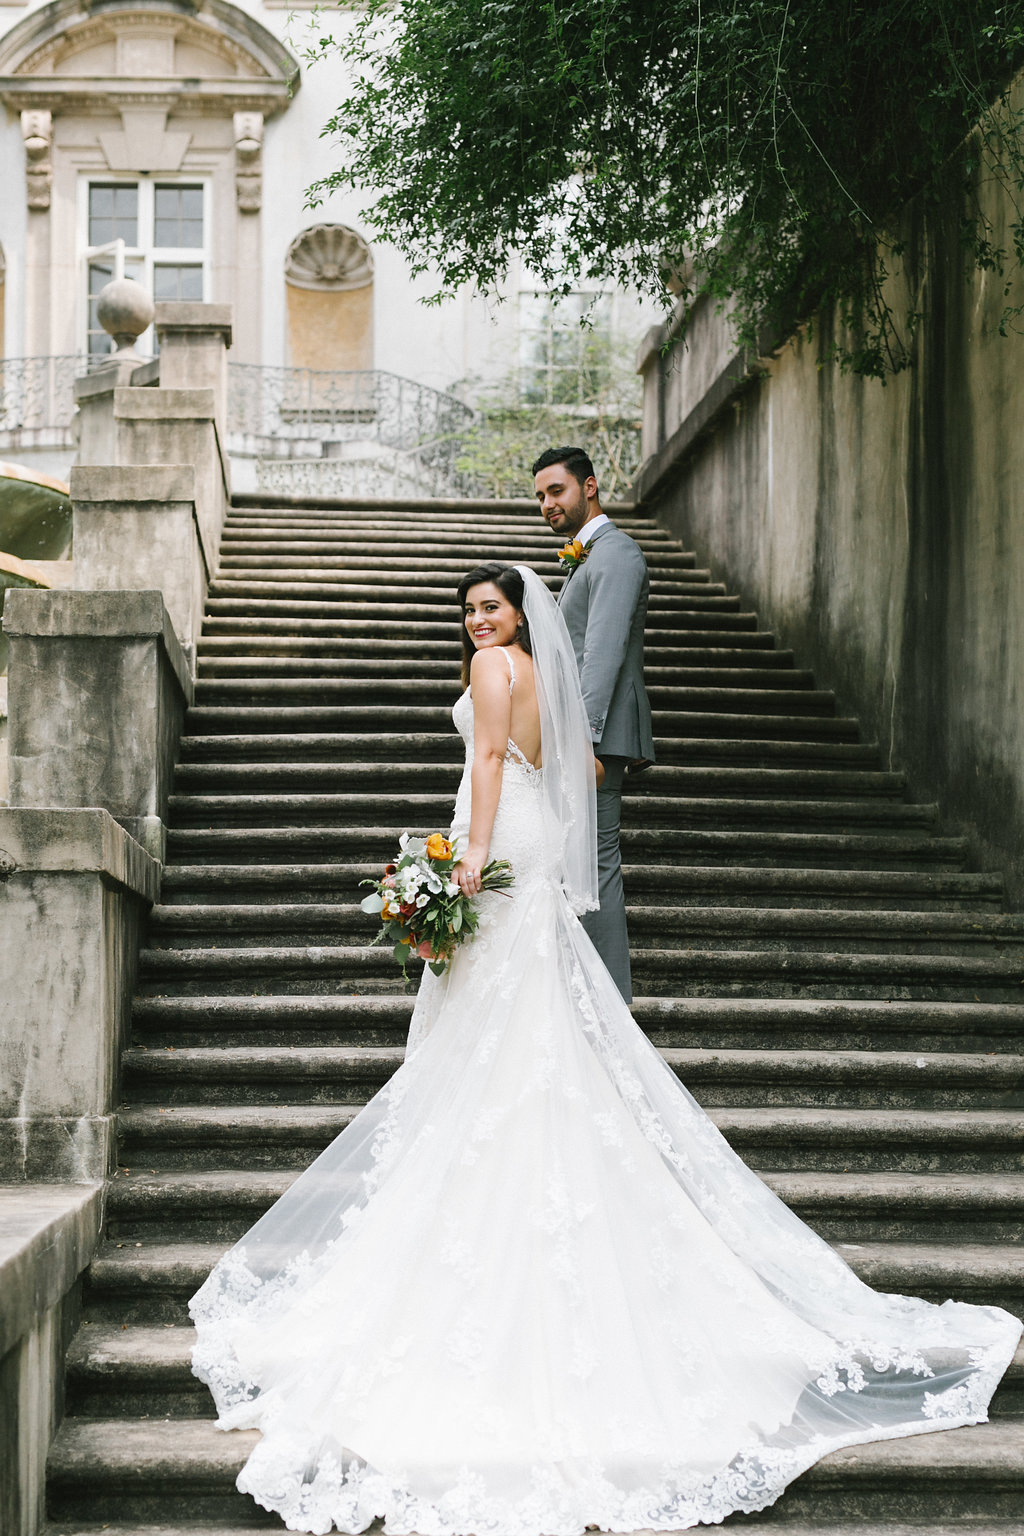 Vibrant Atlanta Wedding Inspiration with Rust Accents - http://ruffledblog.com/vibrant-atlanta-wedding-inspiration-with-rust-accents